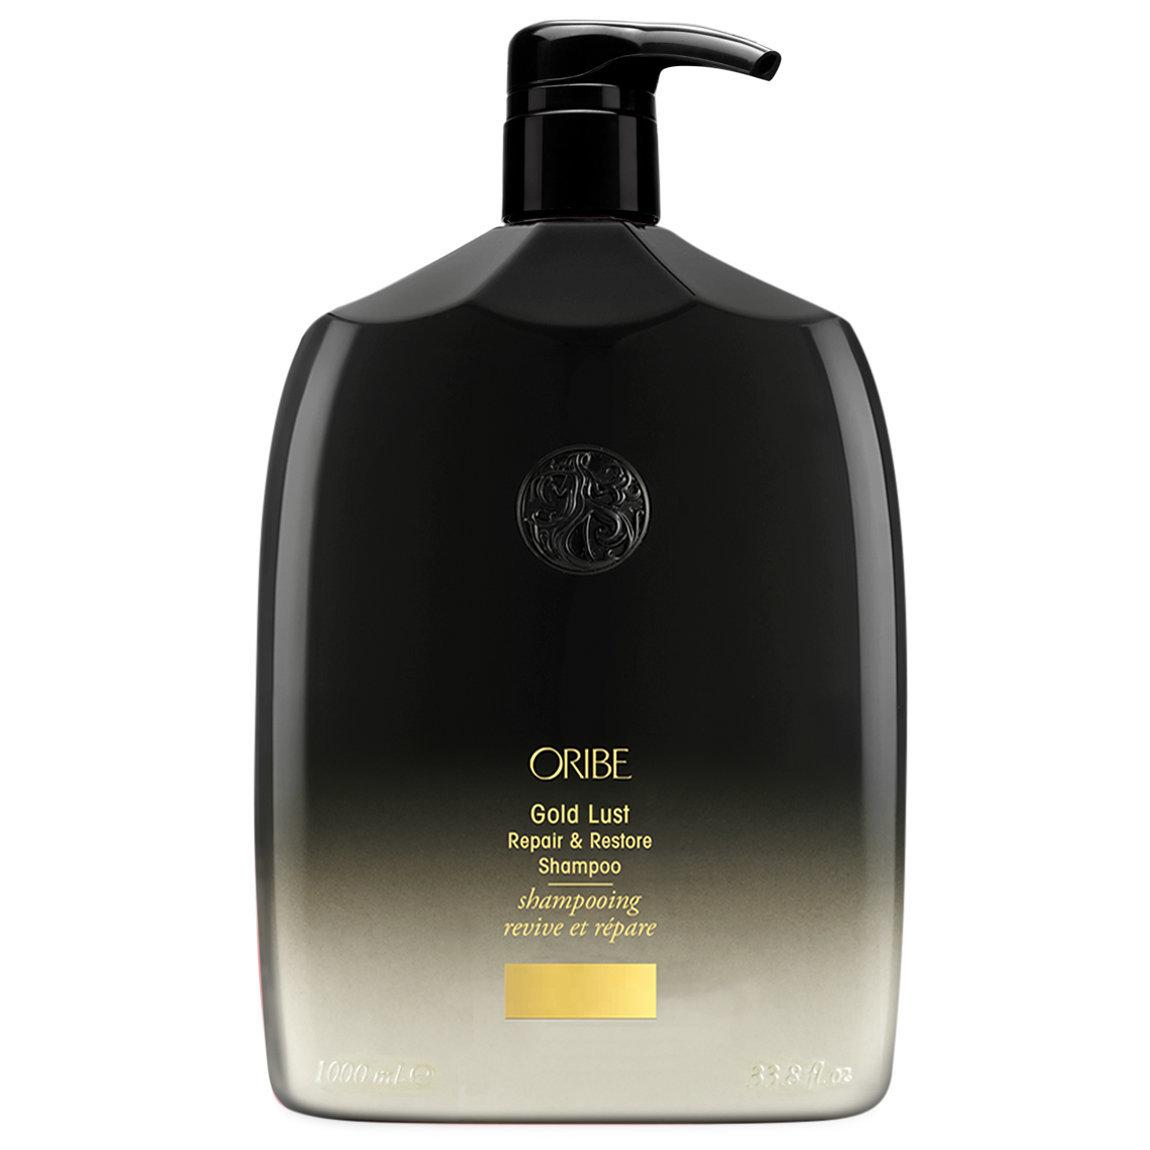 Oribe Gold Lust Repair & Restore Shampoo 1 L alternative view 1 - product swatch.